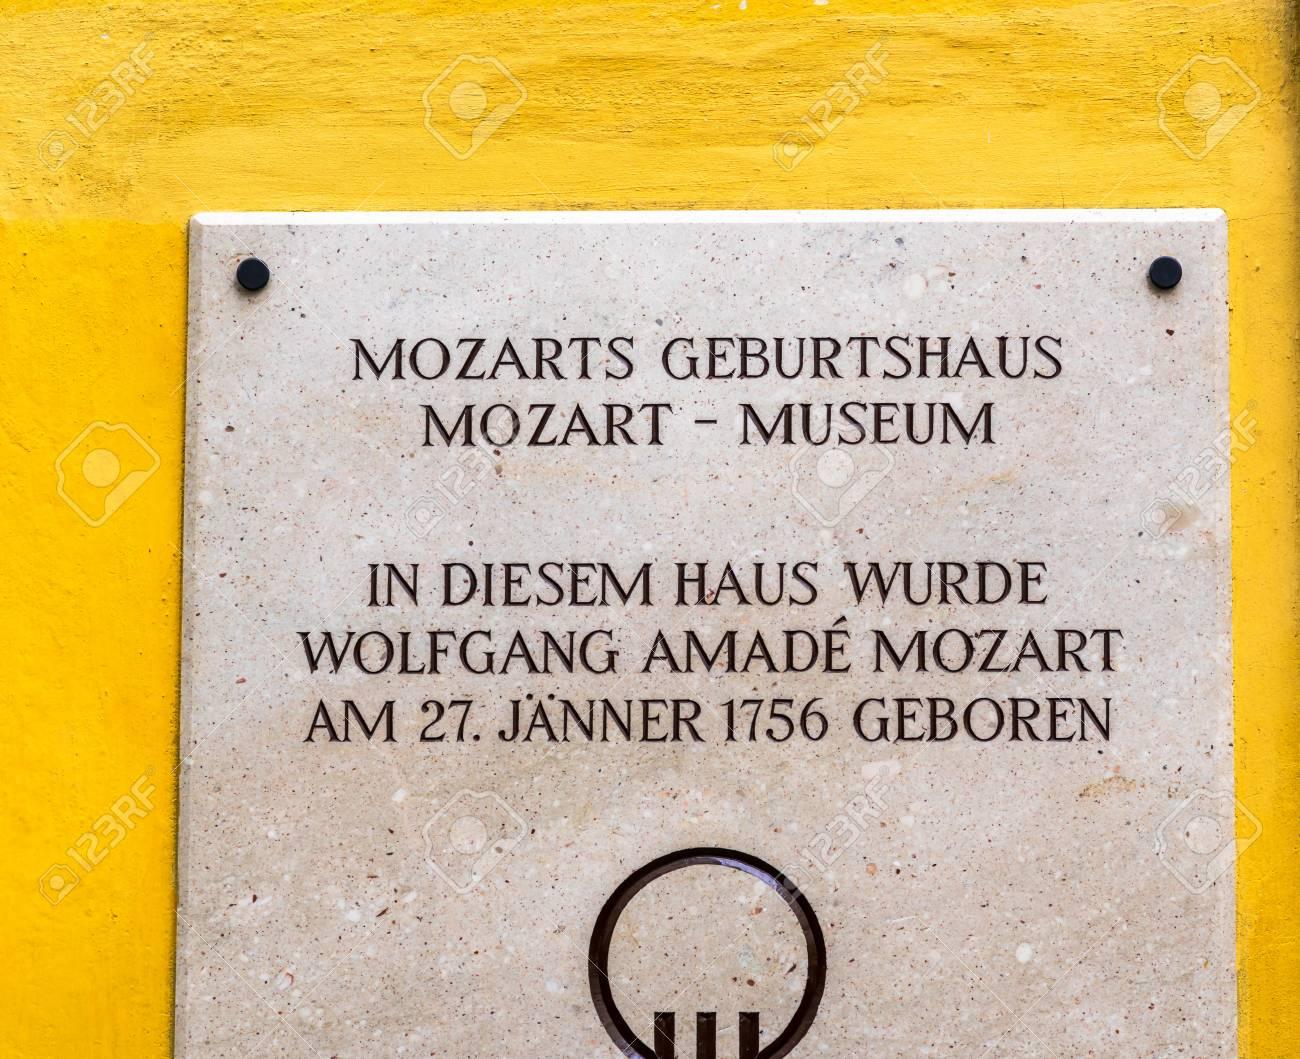 Komponist 1756 geboren